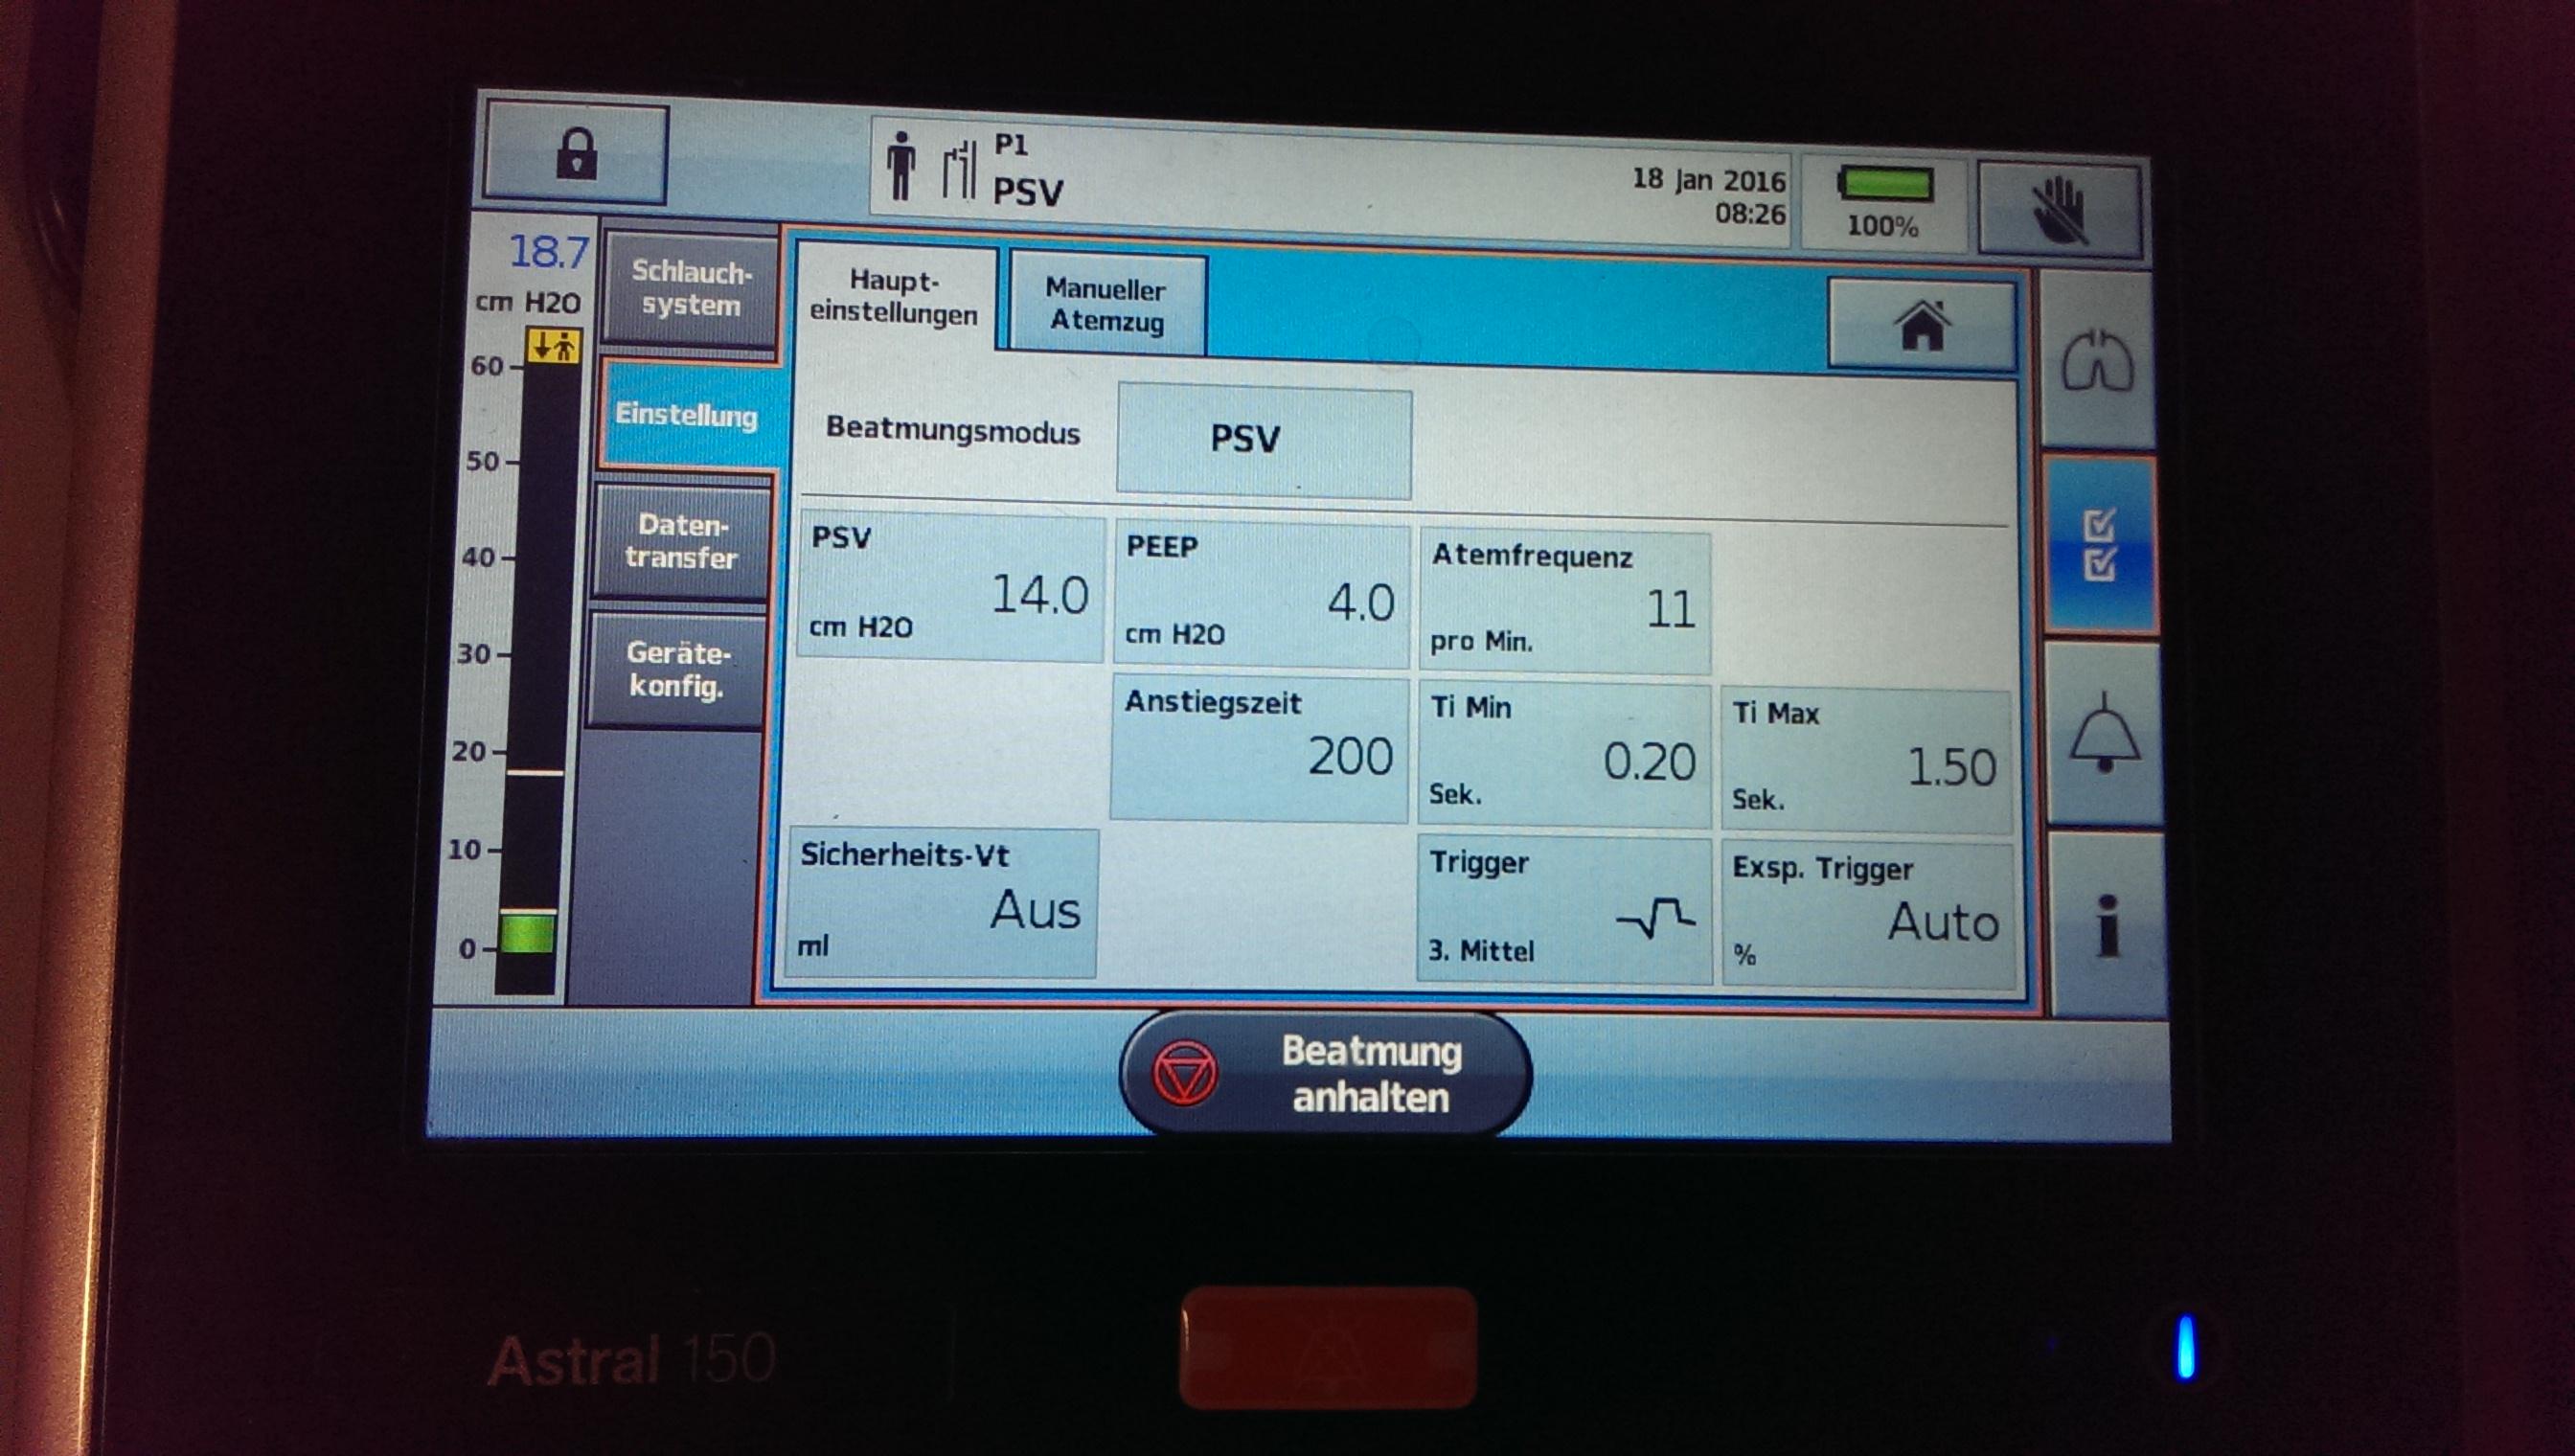 PSV-Atmung an der Astral 150, Fa. ResMed